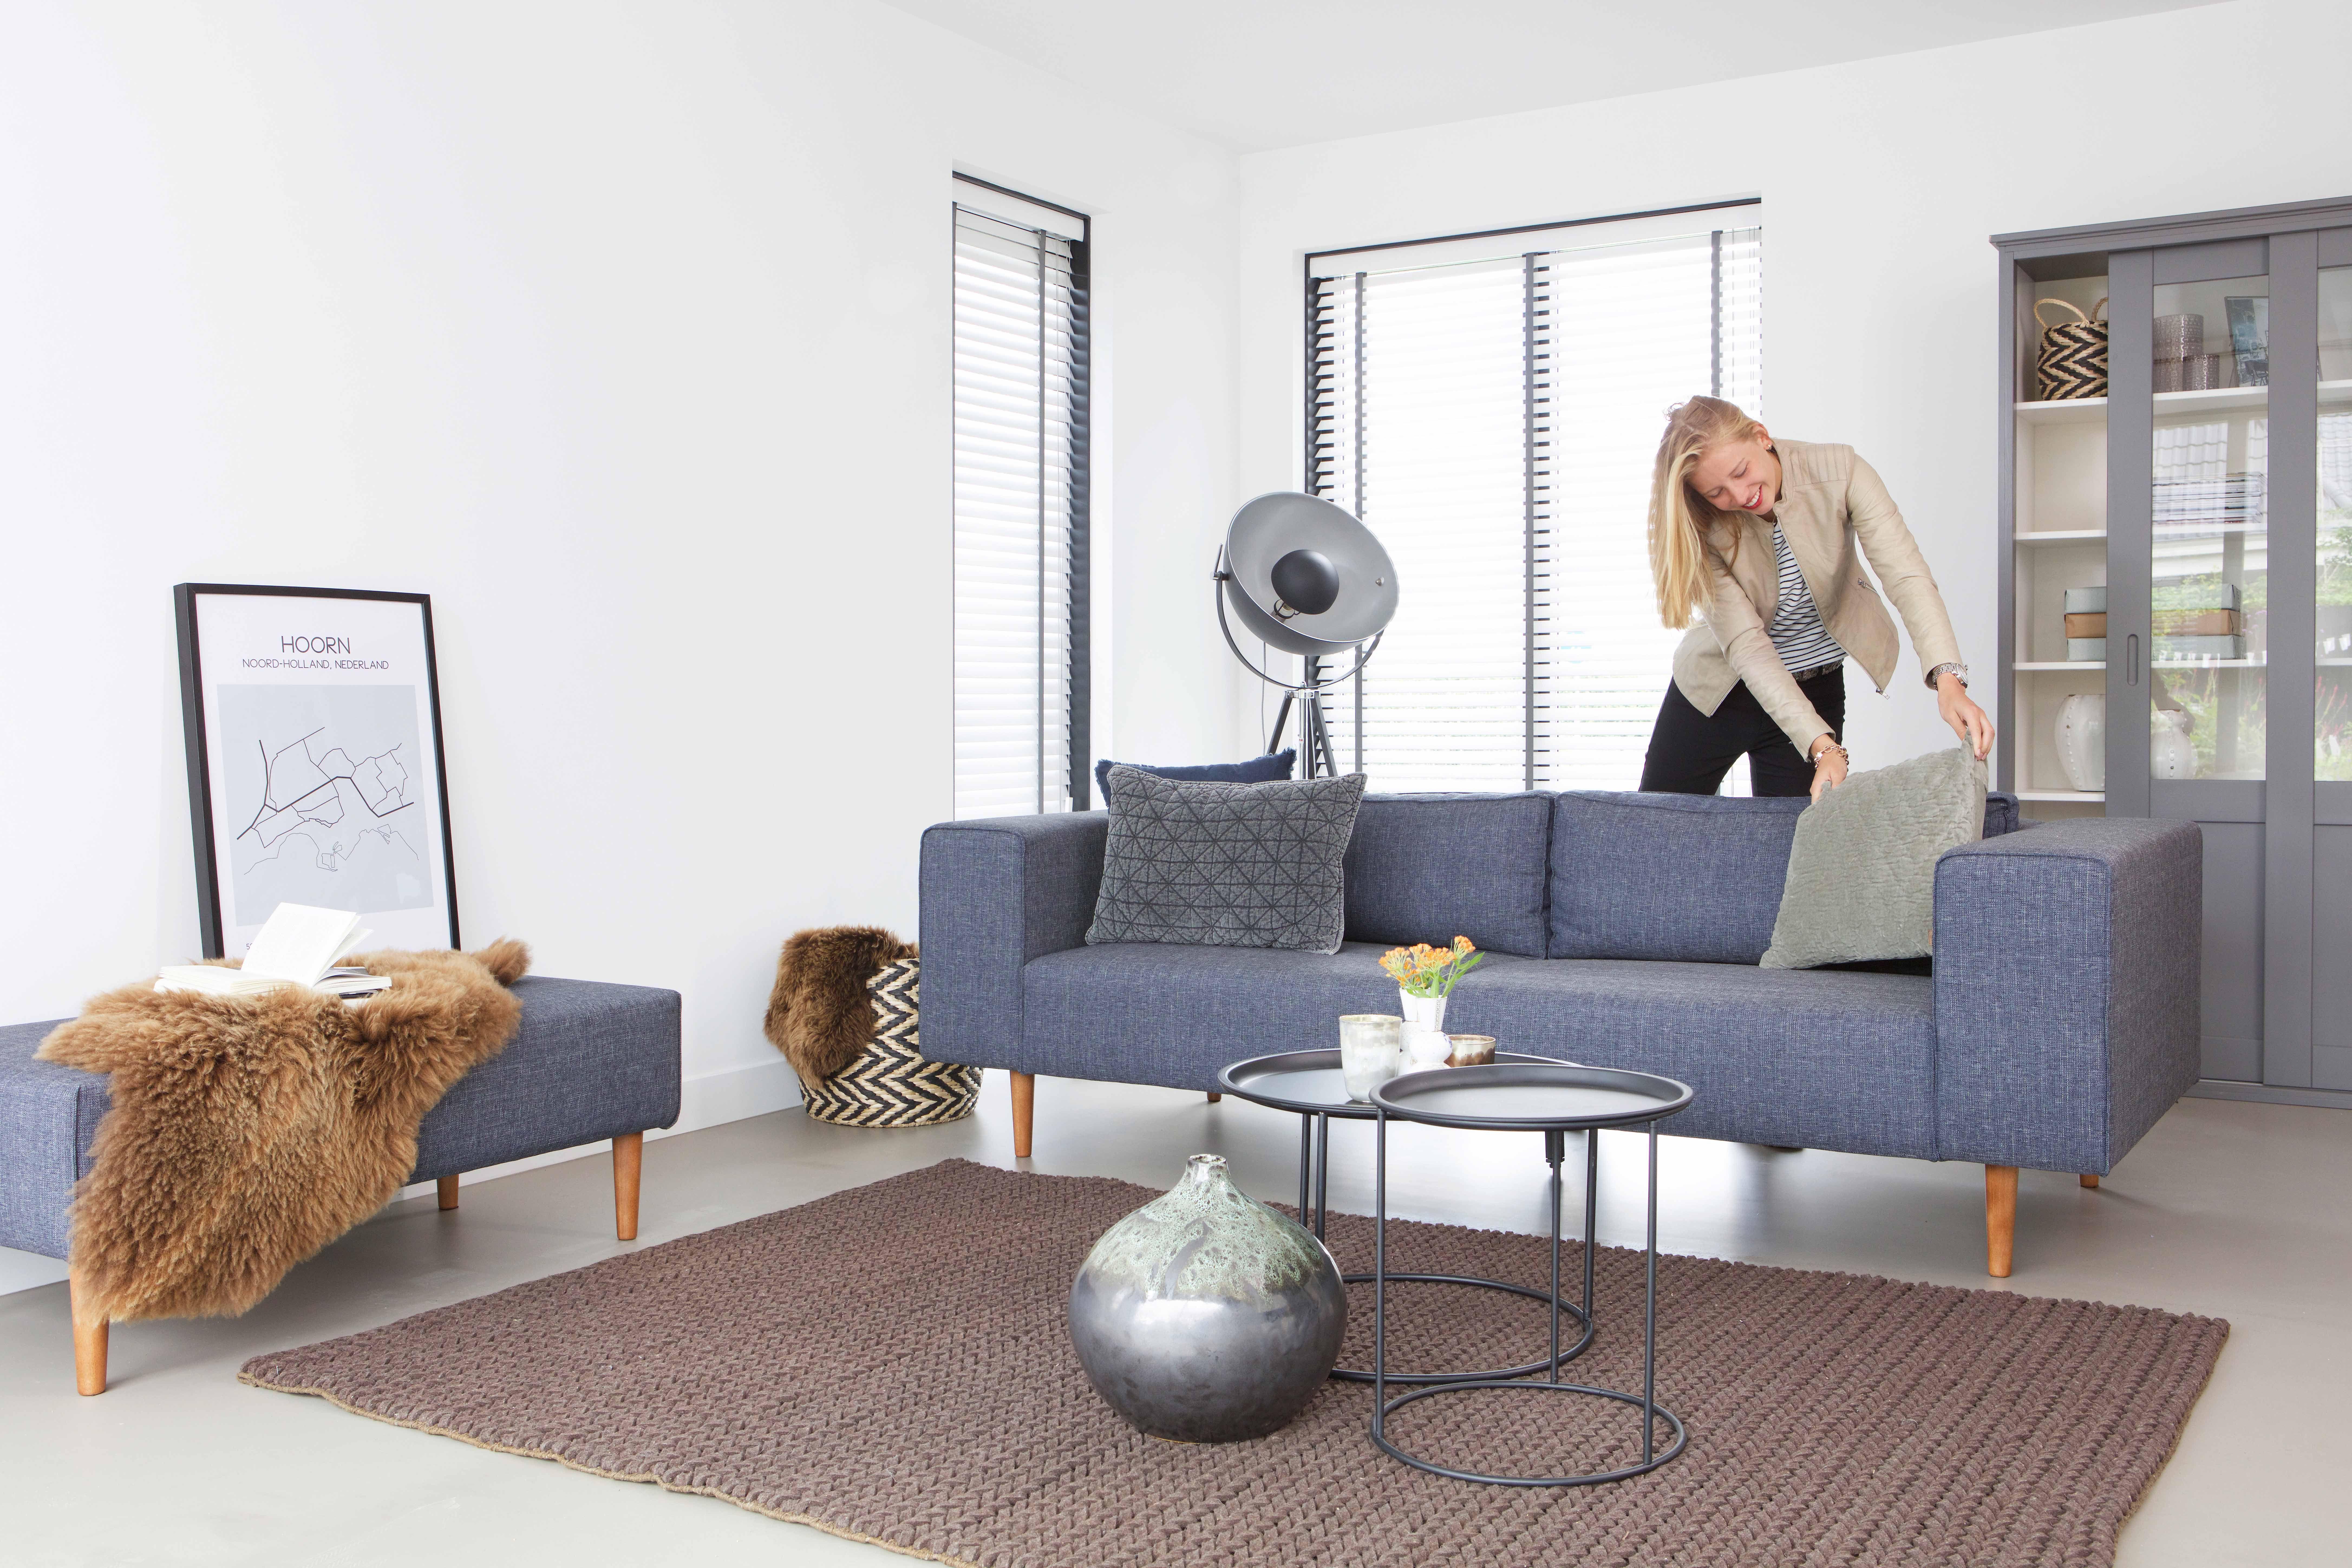 bank sofa bjork u hocker by woood woood bank sofa hocker with couch mit hocker with woood. Black Bedroom Furniture Sets. Home Design Ideas